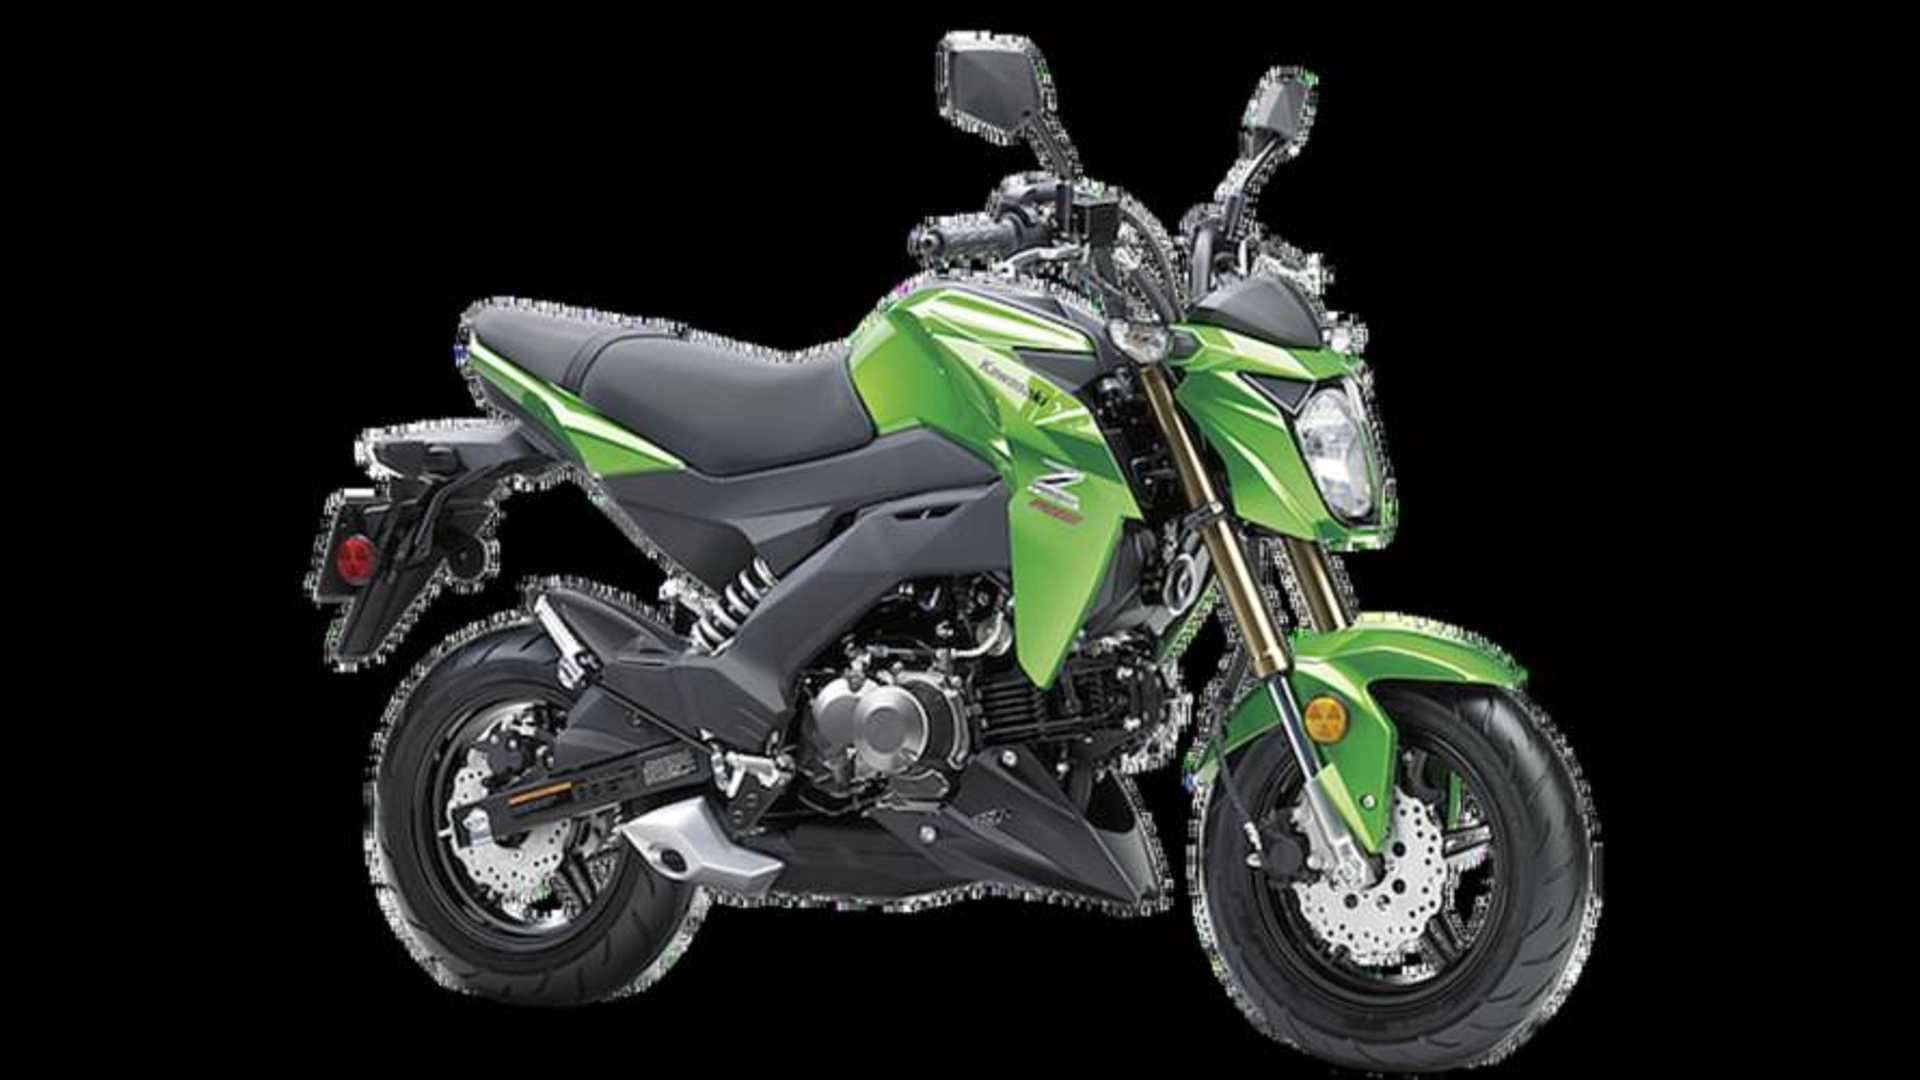 Kawasaki Recalls Z125 Pro Models For Faulty Ecu Programming